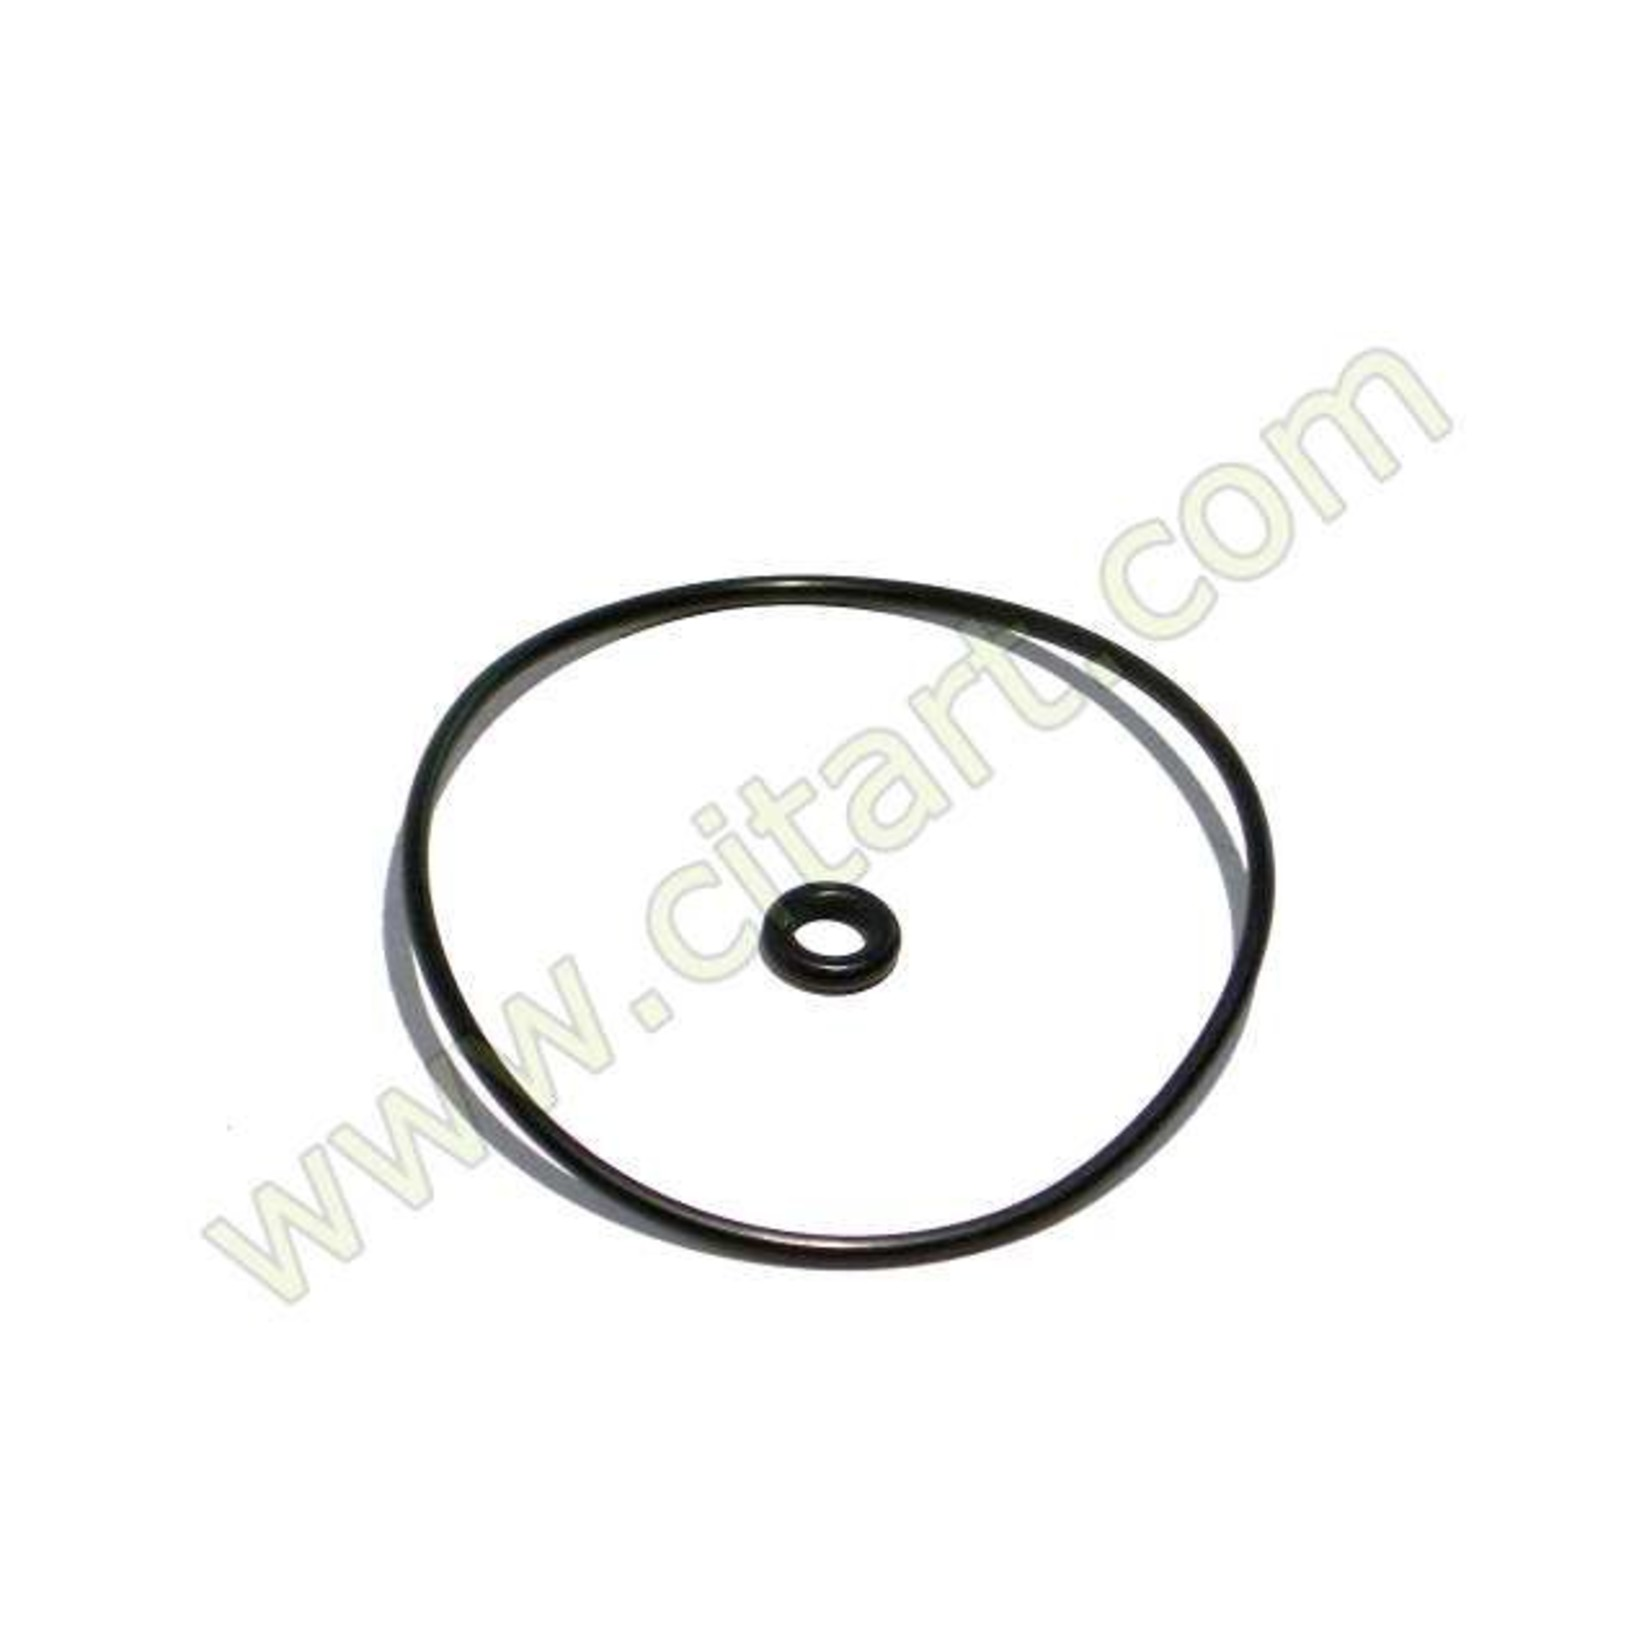 Joint torique filtre huile grand Nr Org: 24888009